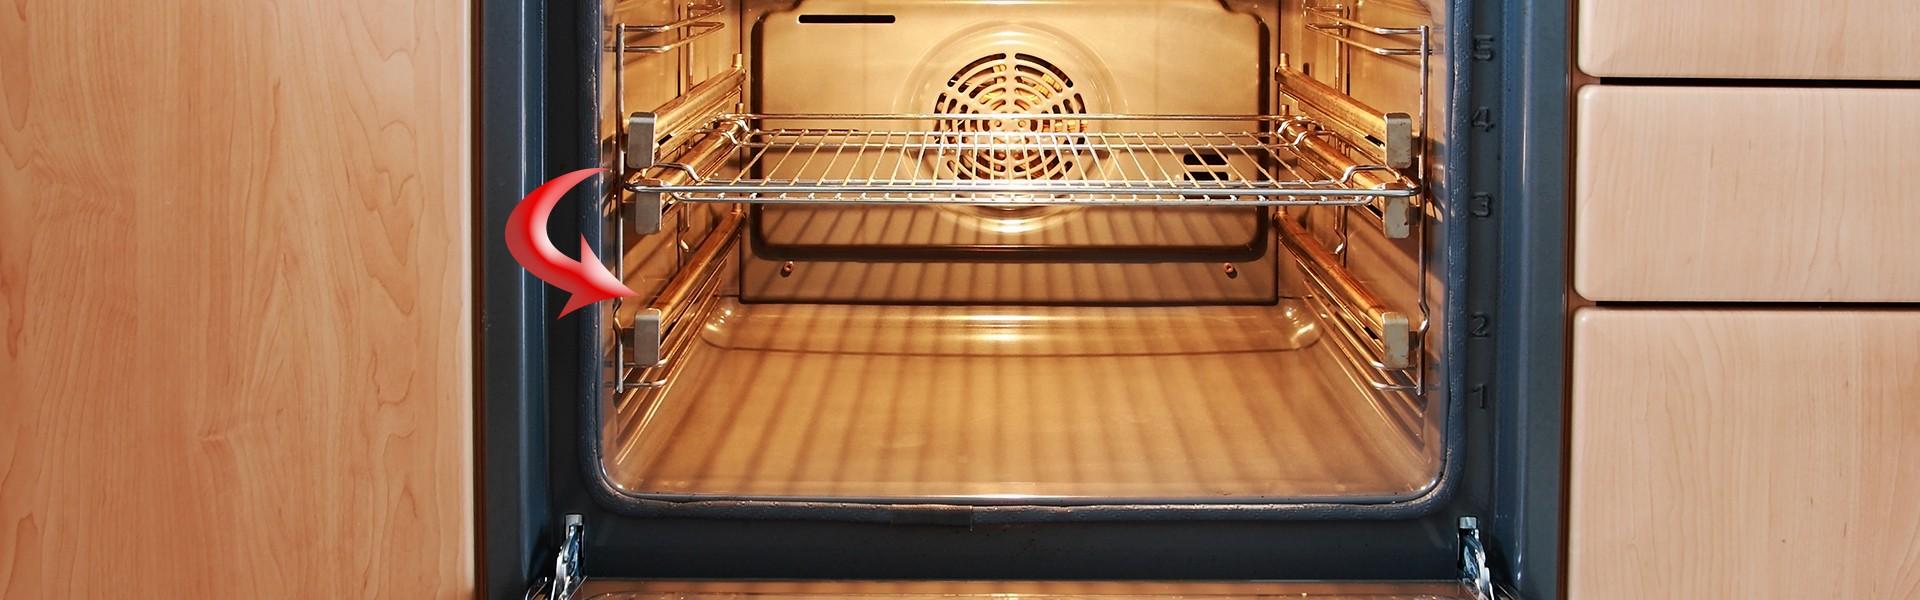 Great Tips For Baking In RV Ovens  RV World Blog